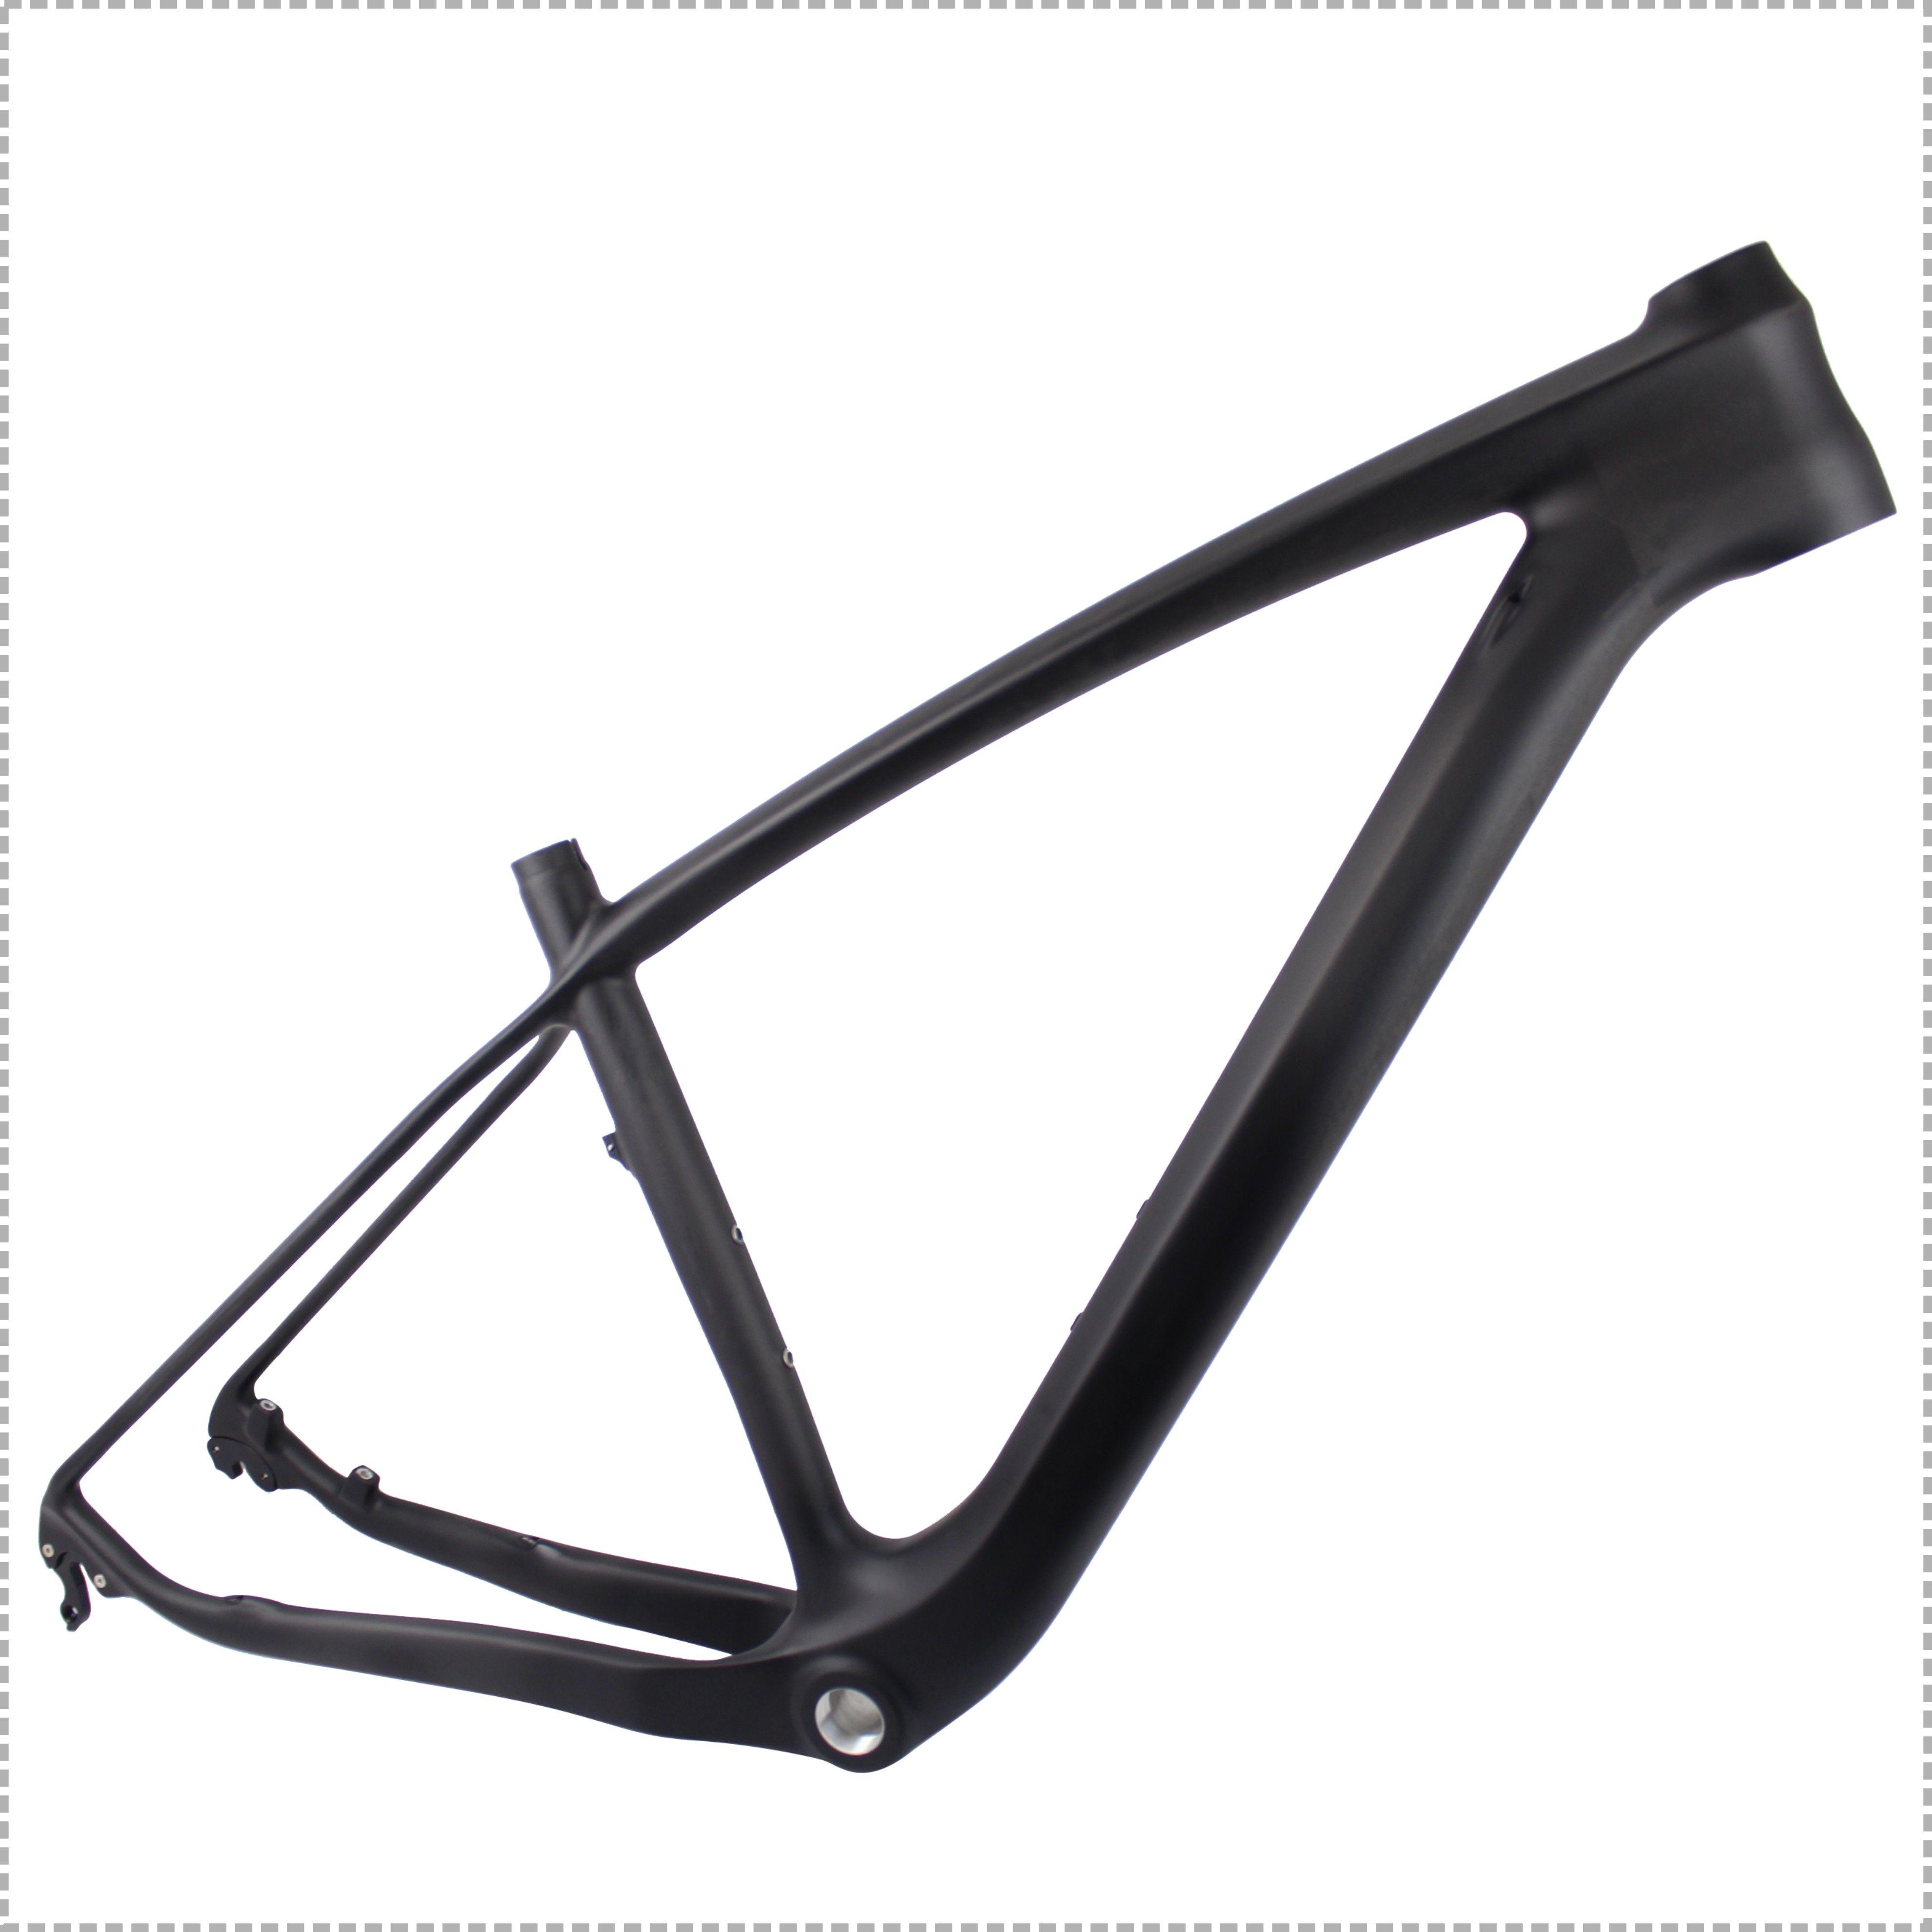 29 mtb frame cs 057 size 15517519 - Mtb Frames